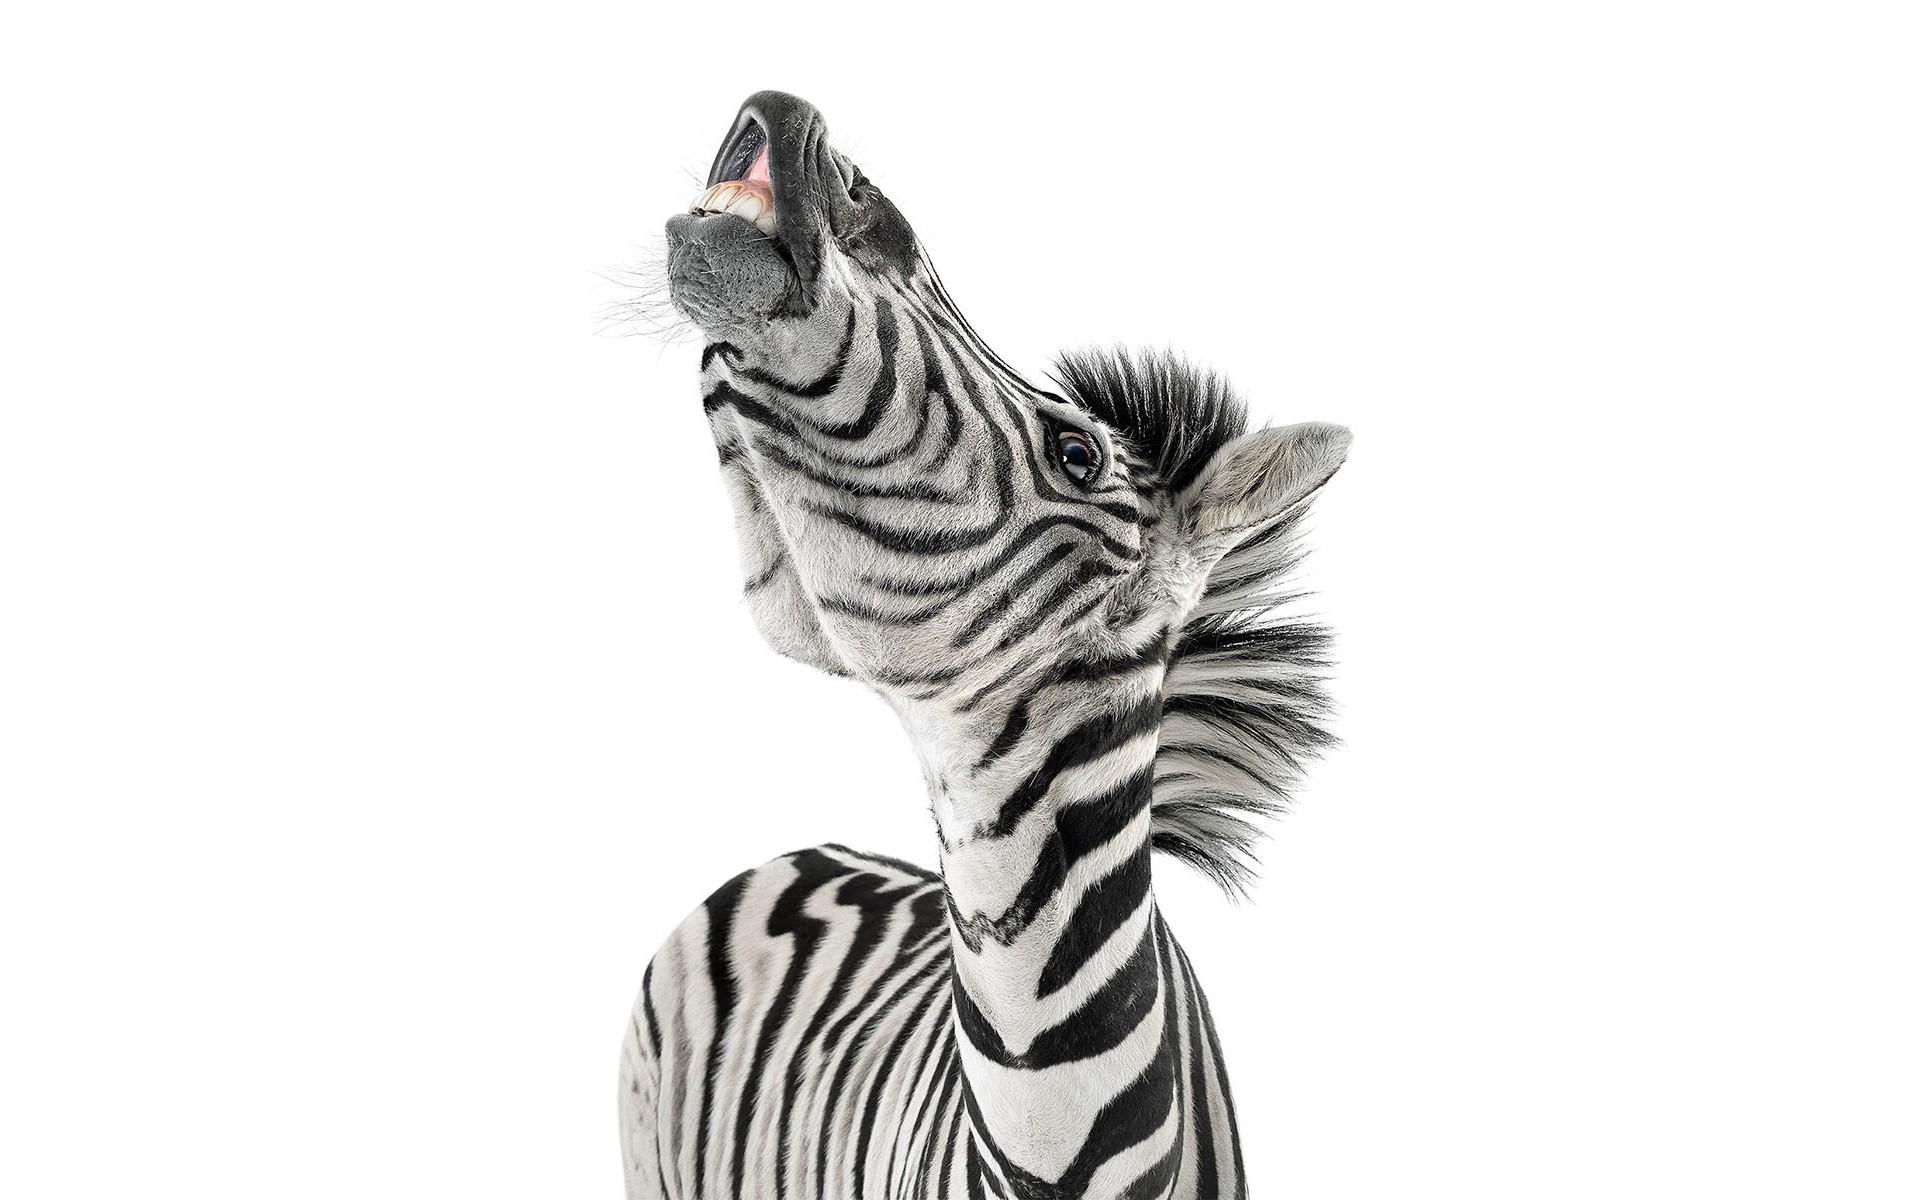 Cebras graciosas - 1920x1200